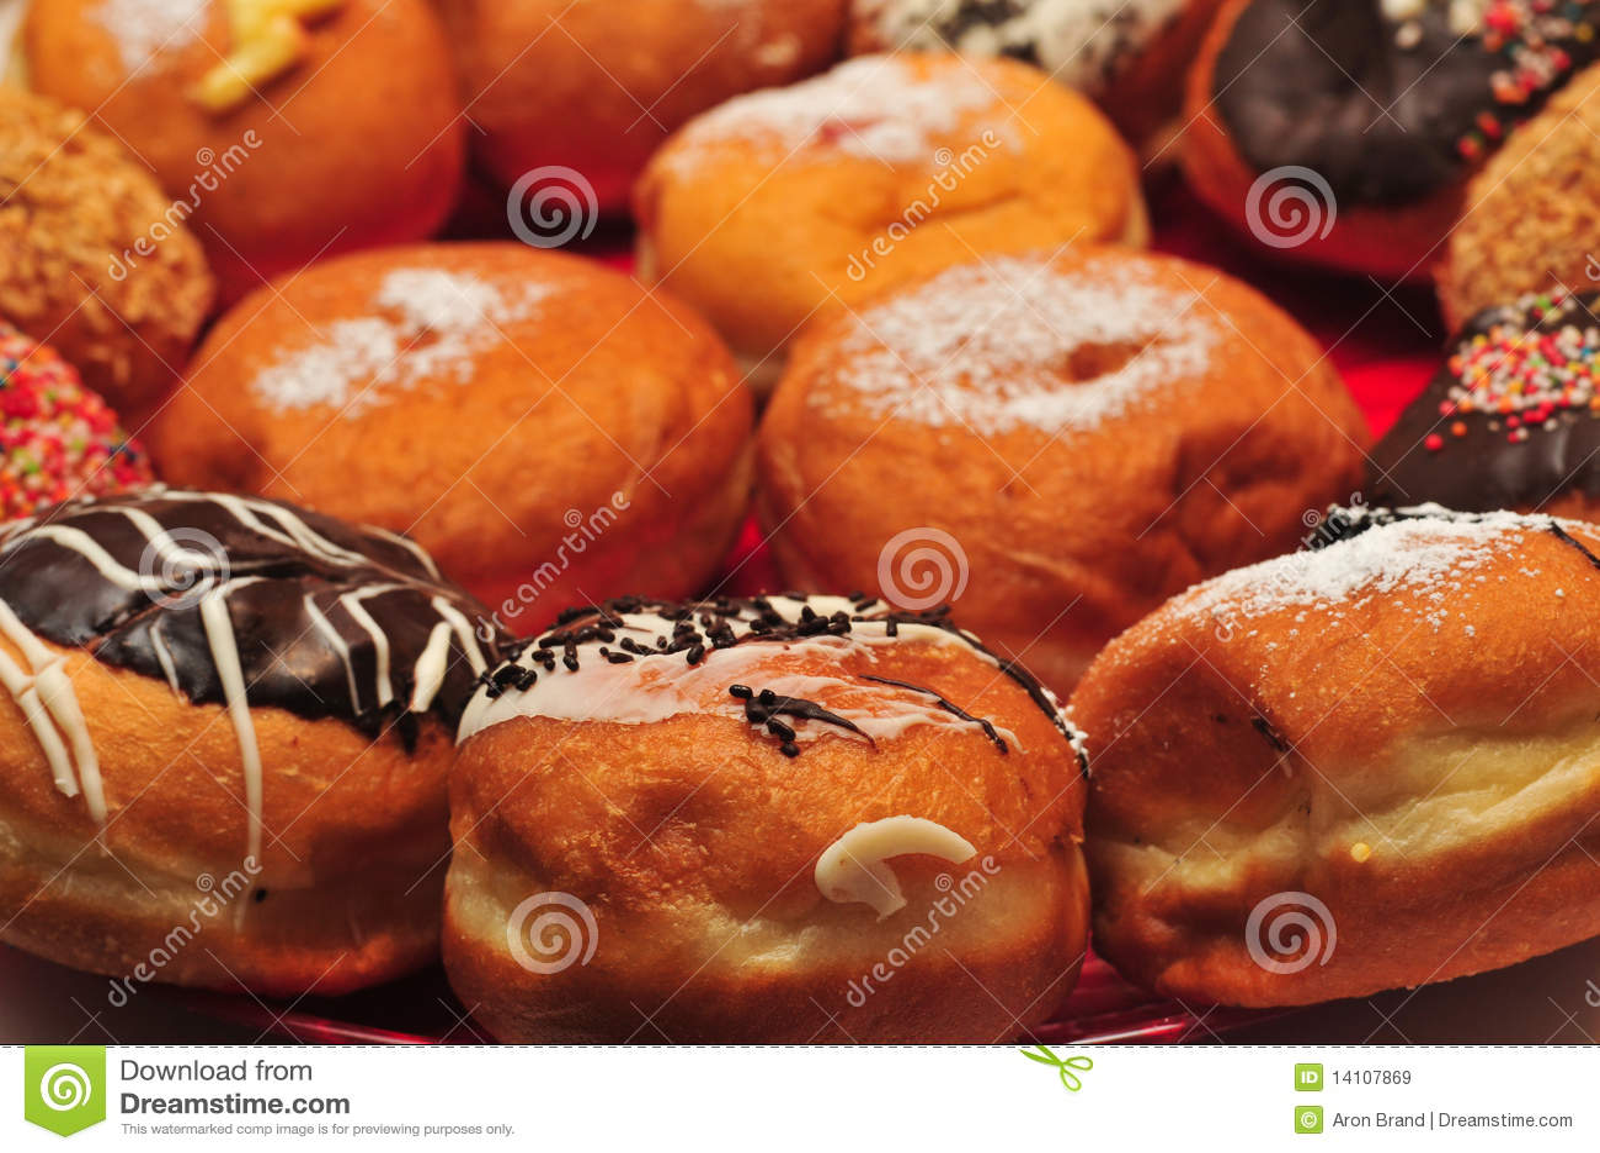 Hanukka Doughnuts Royalty Free Stock Images - Image: 14107869